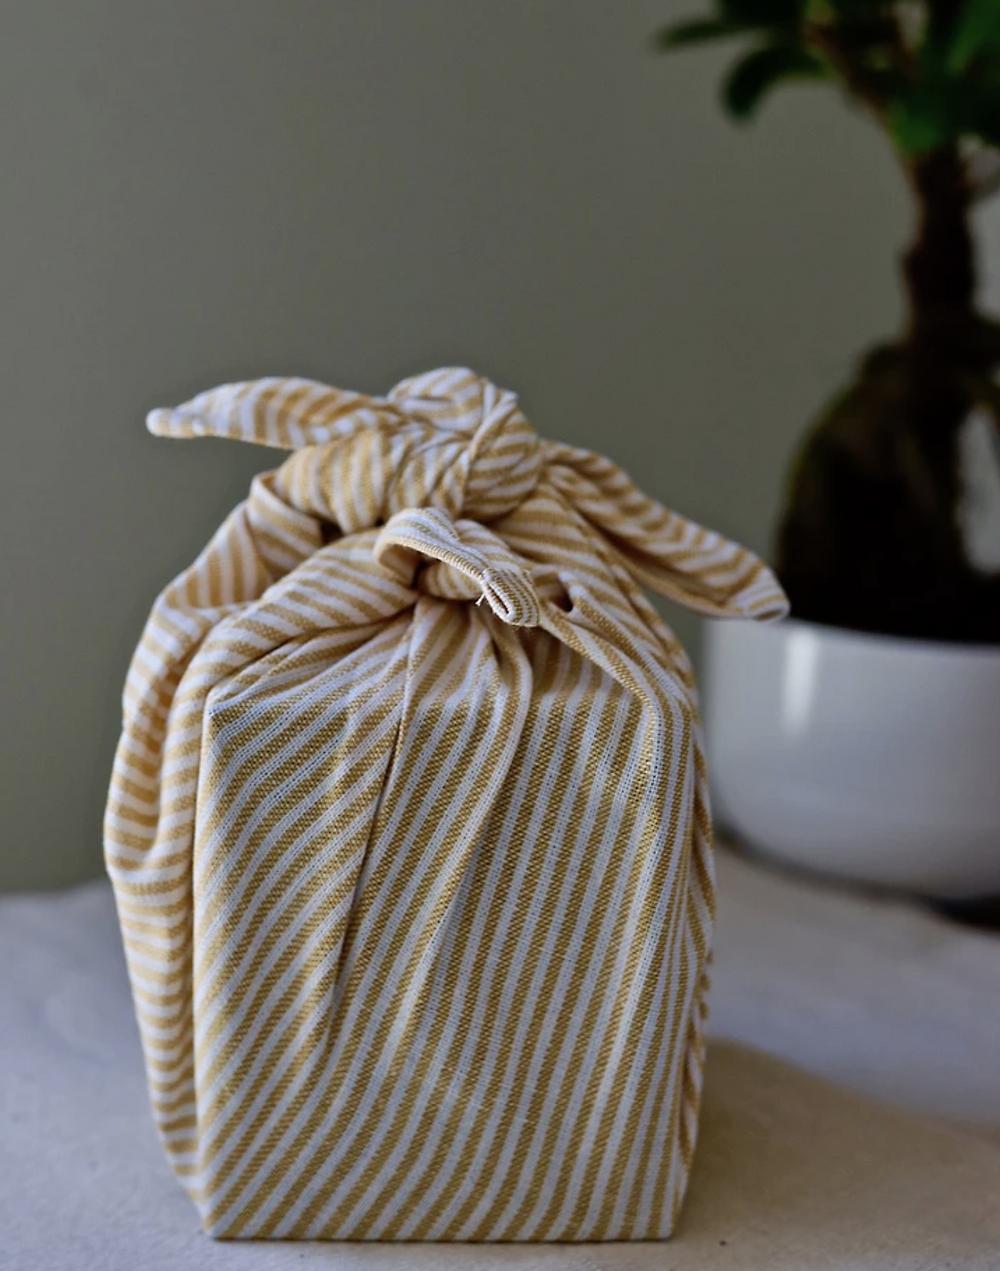 Wrapuccino, learn furoski, sustainable wrapping